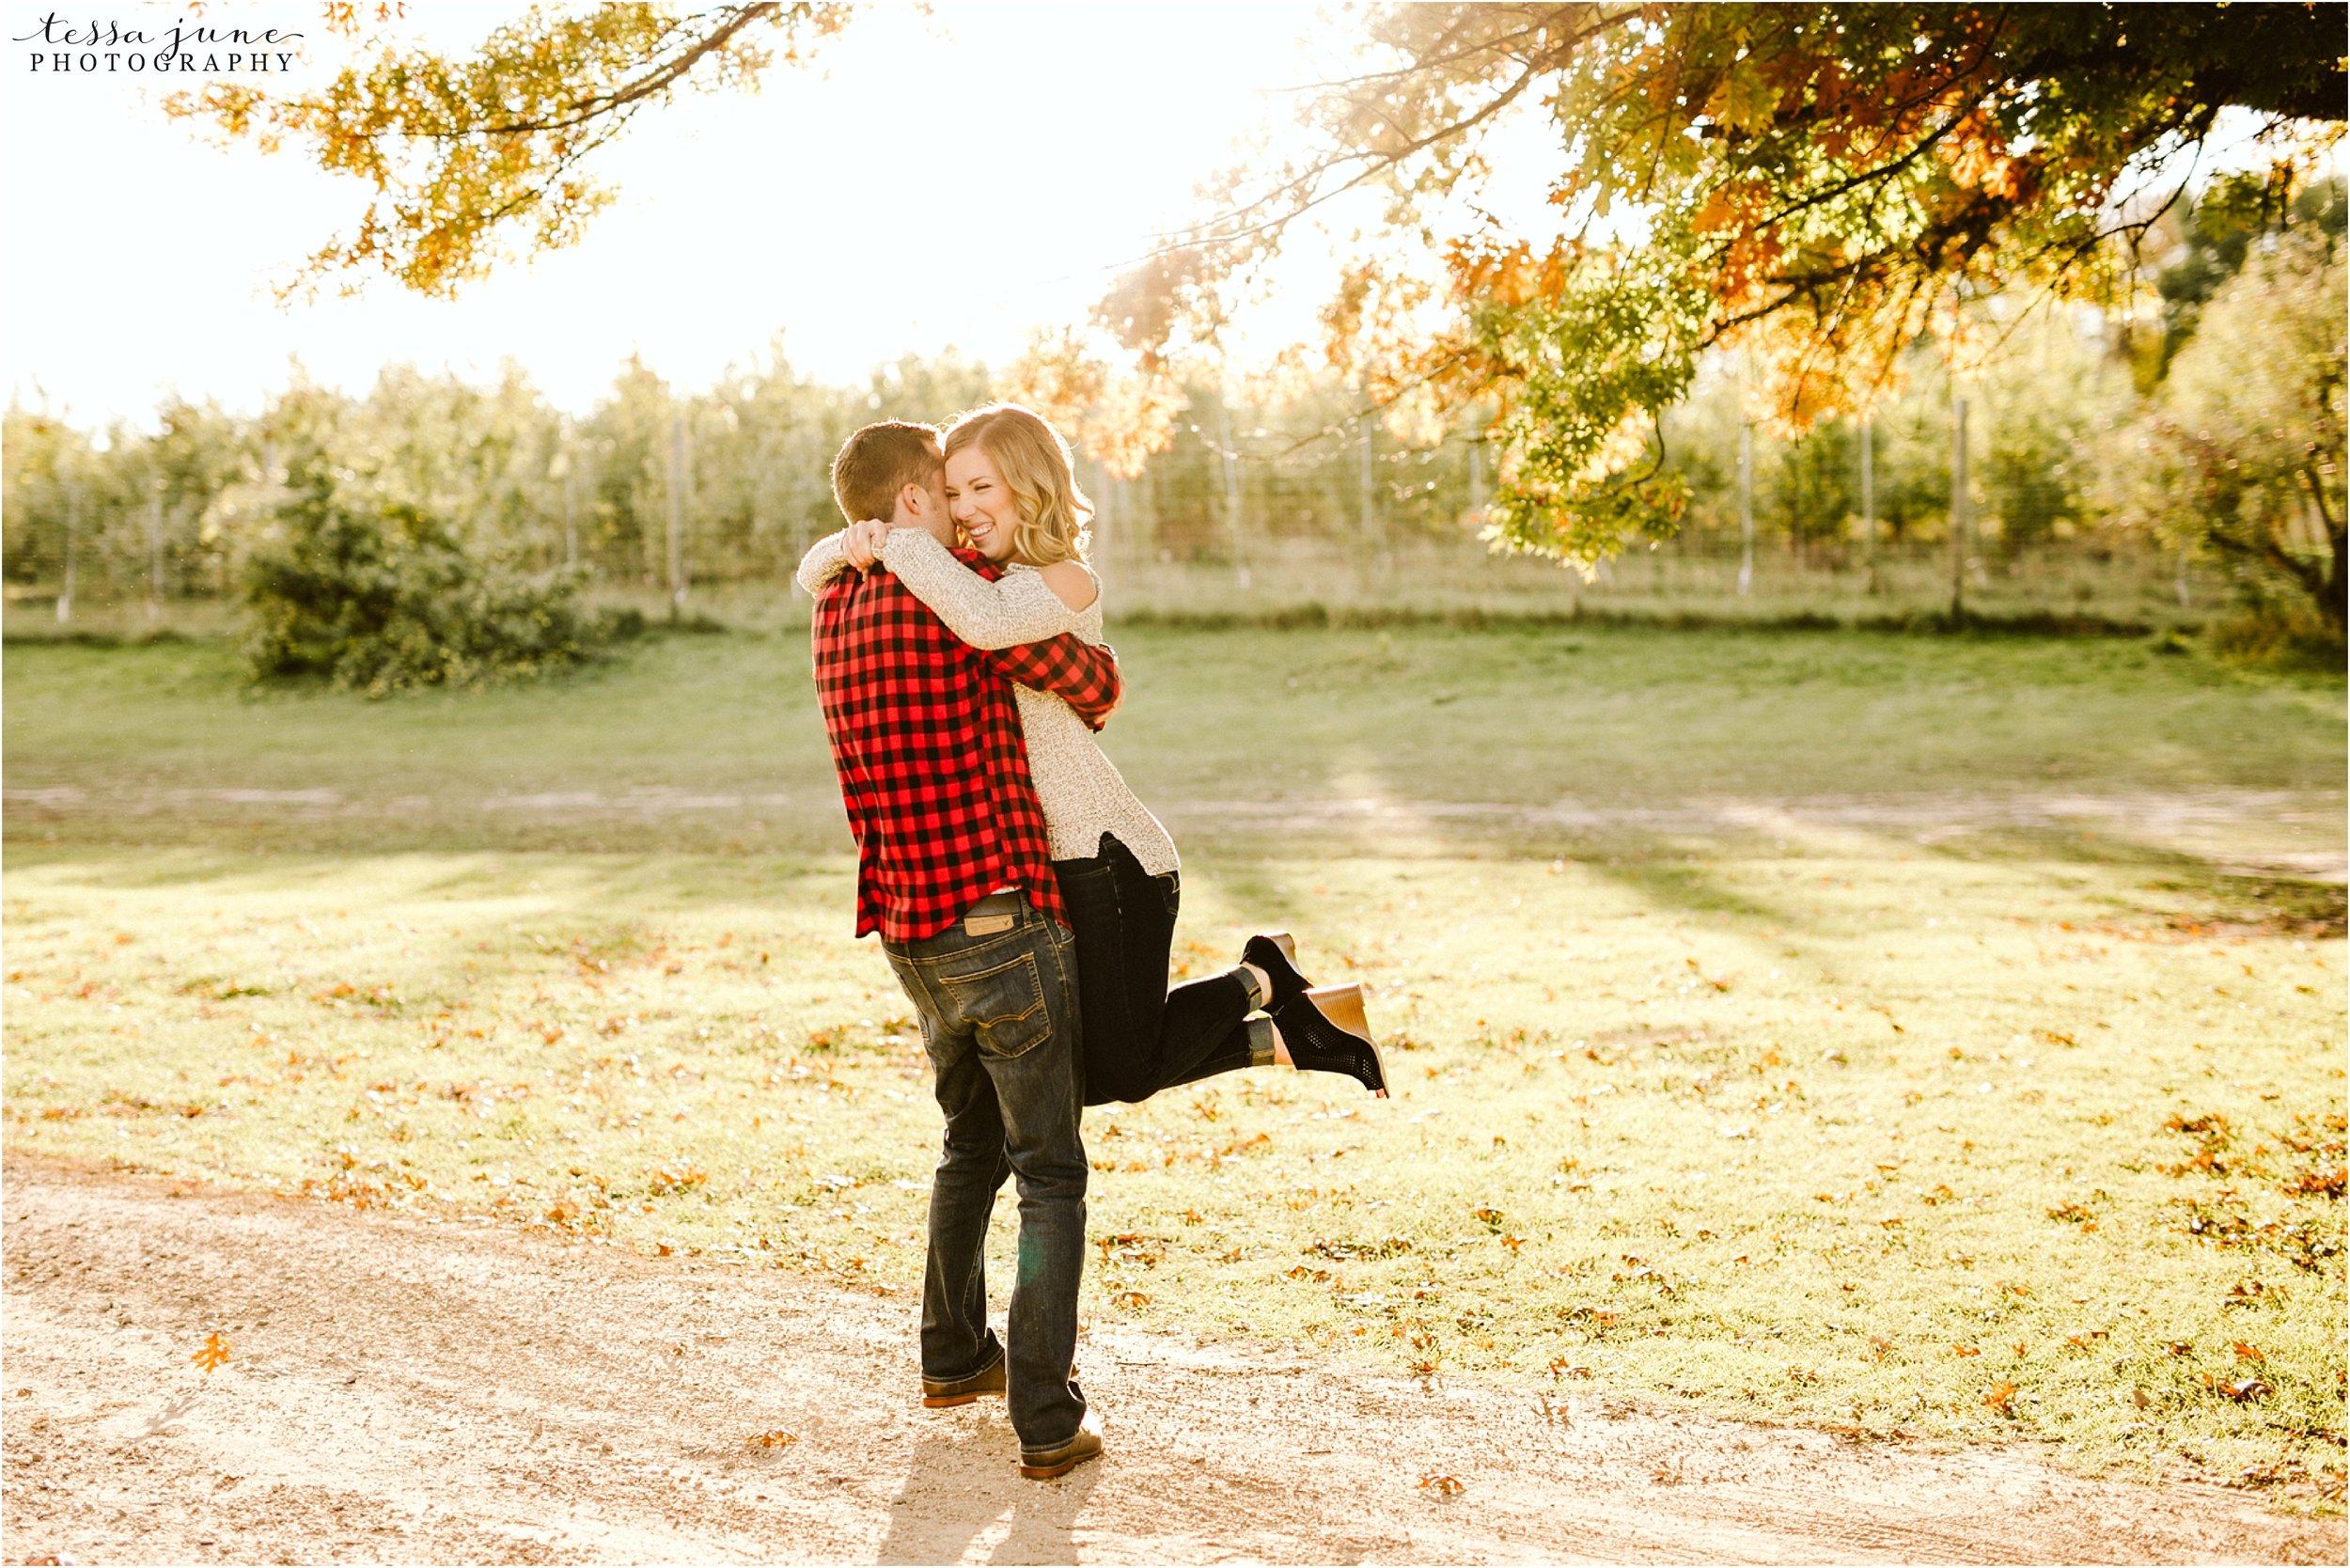 st-cloud-wedding-photographer-deer-lake-orchard-engagement-19.jpg